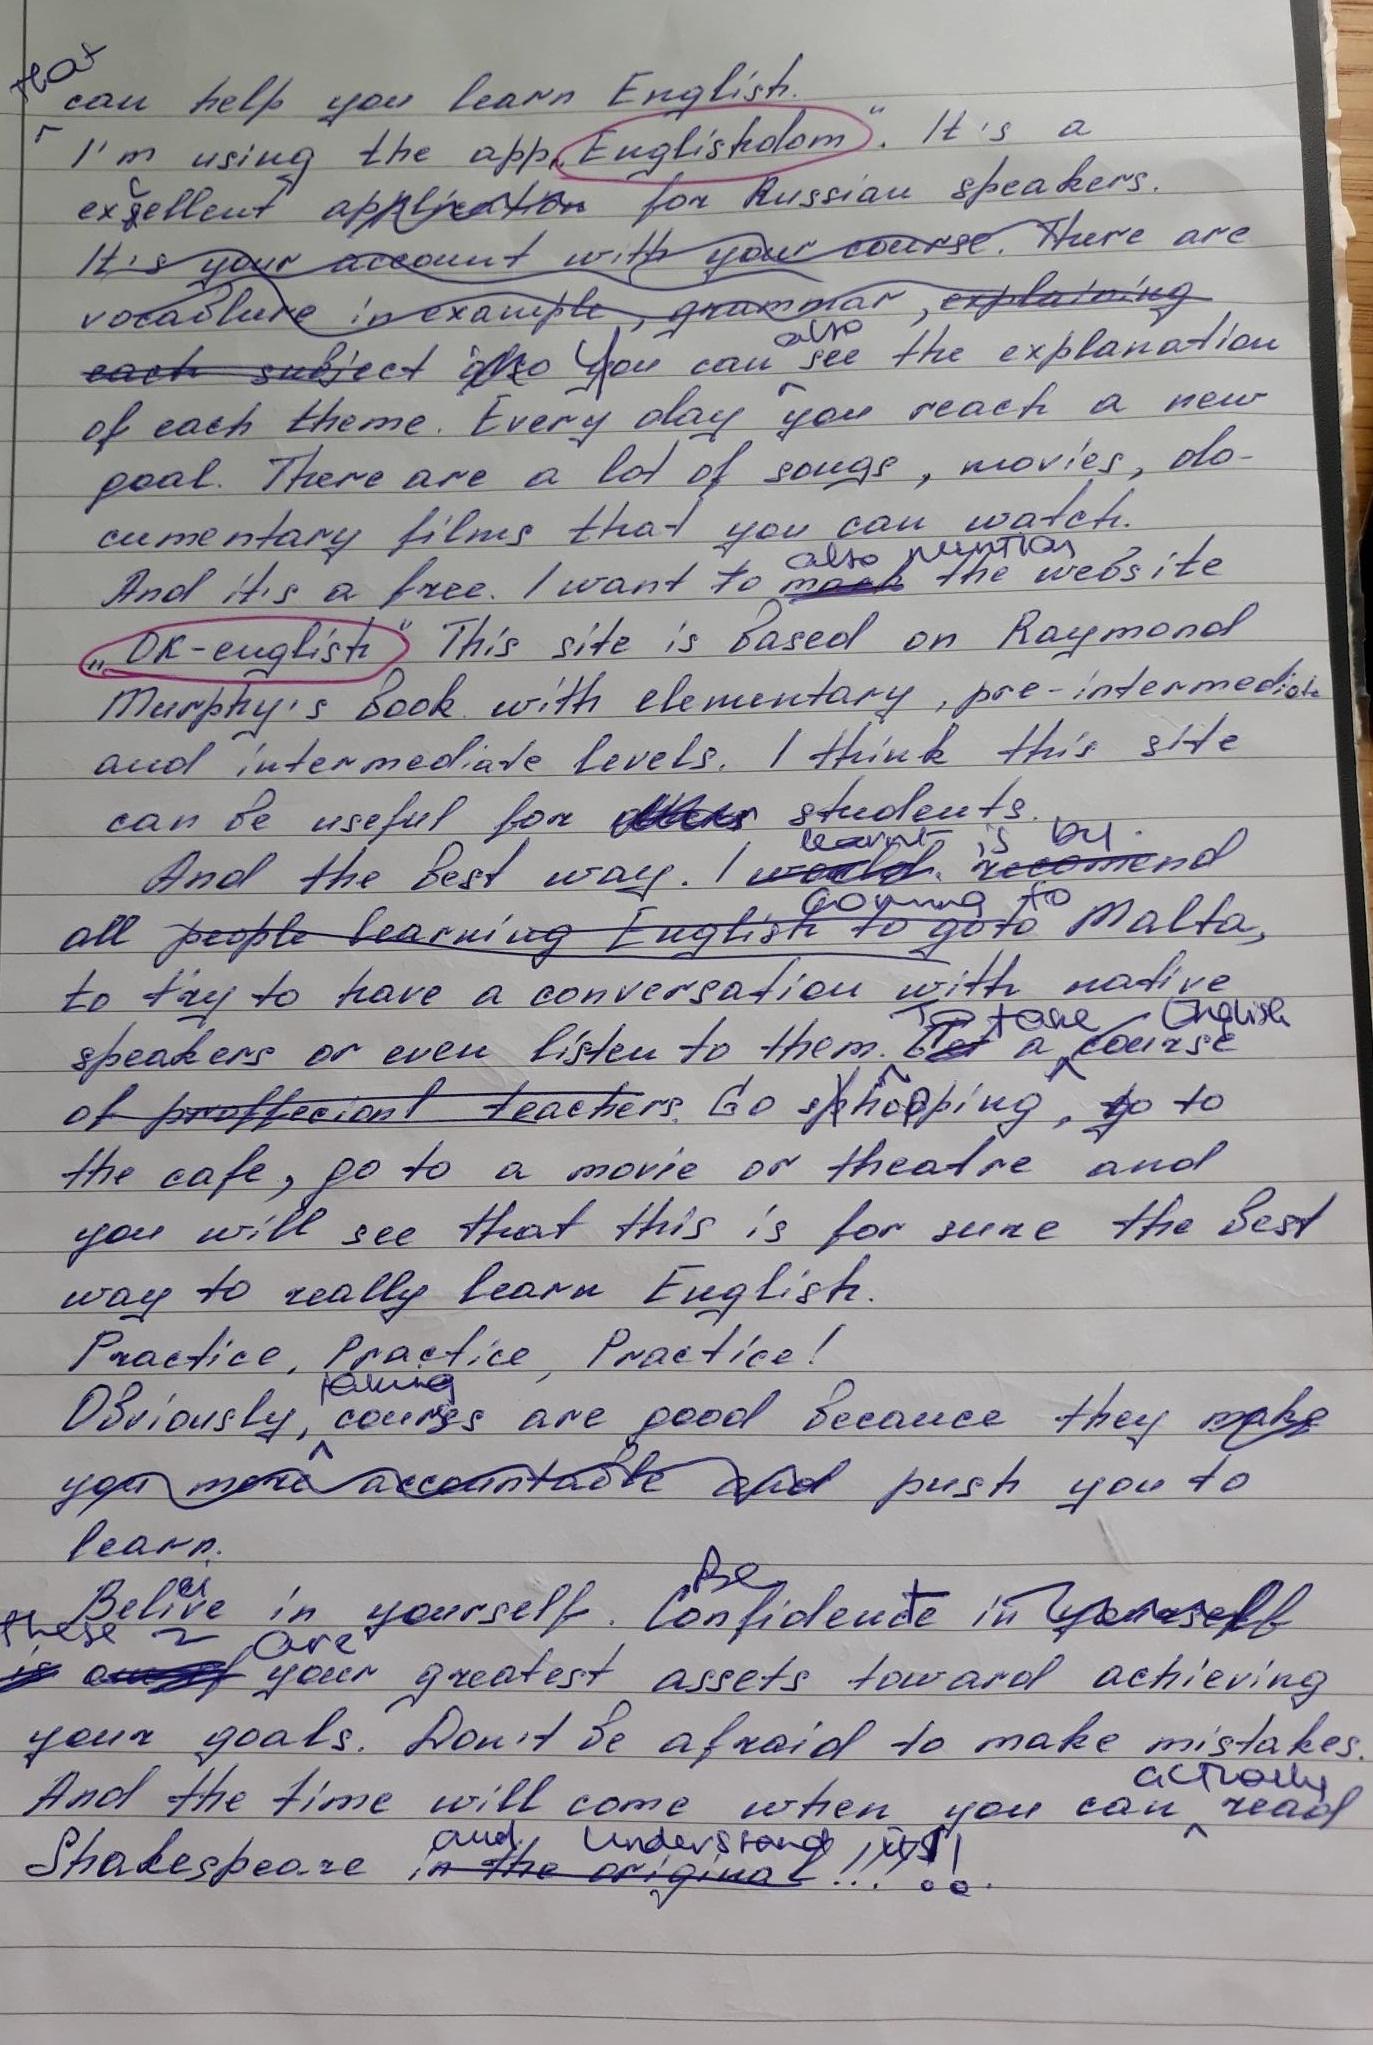 Ukrainian student's feedback of learning English in Malta with Gateway School of English